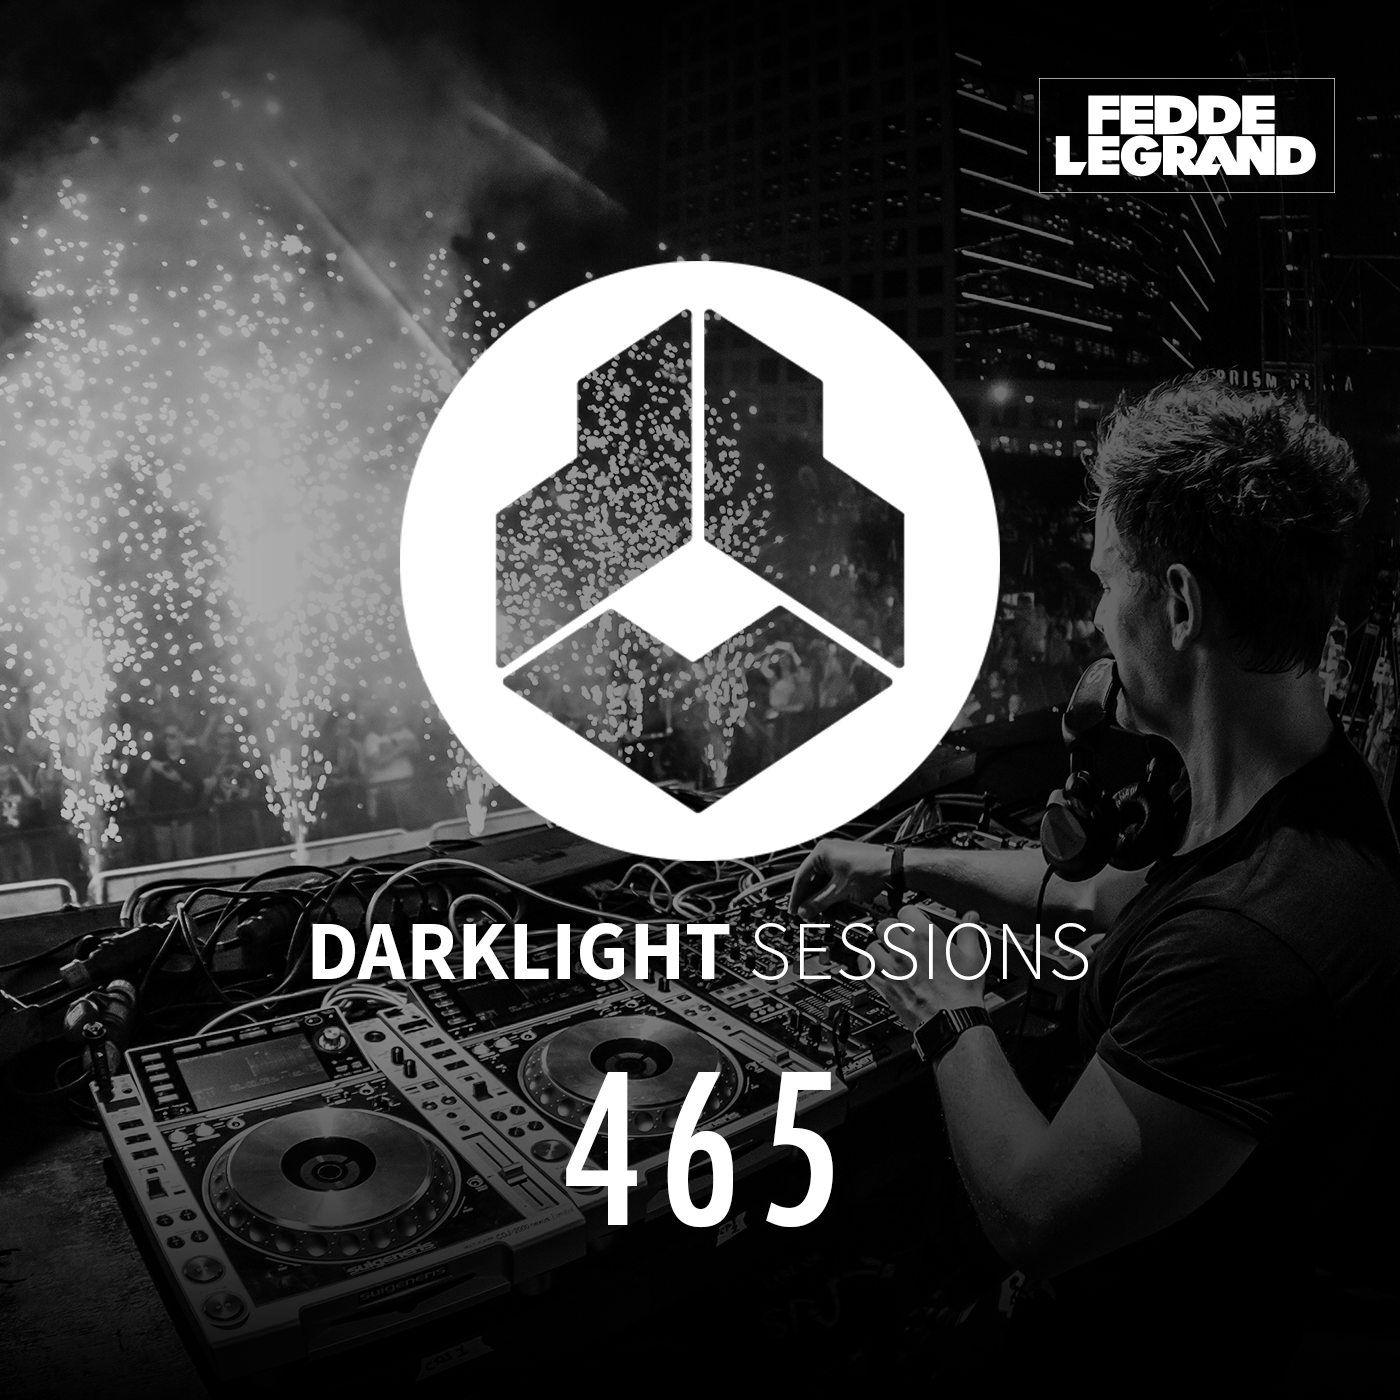 Darklight Sessions 465